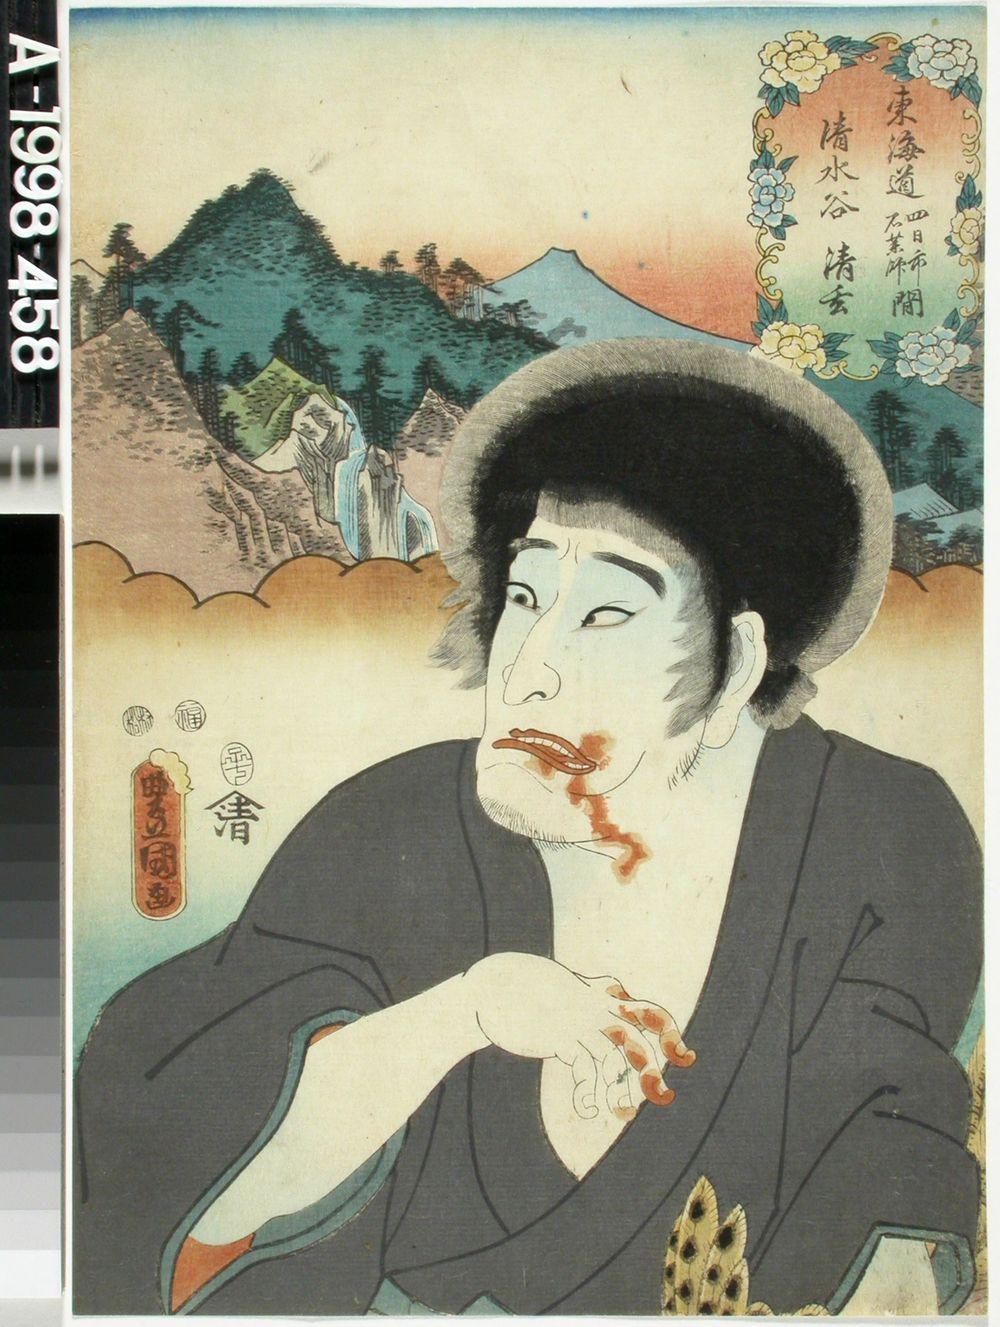 Tokaido gojusan-tsugi (Viisikymmentäkolme kyytiasemaa). Yokkaichi-Ishiyakushi